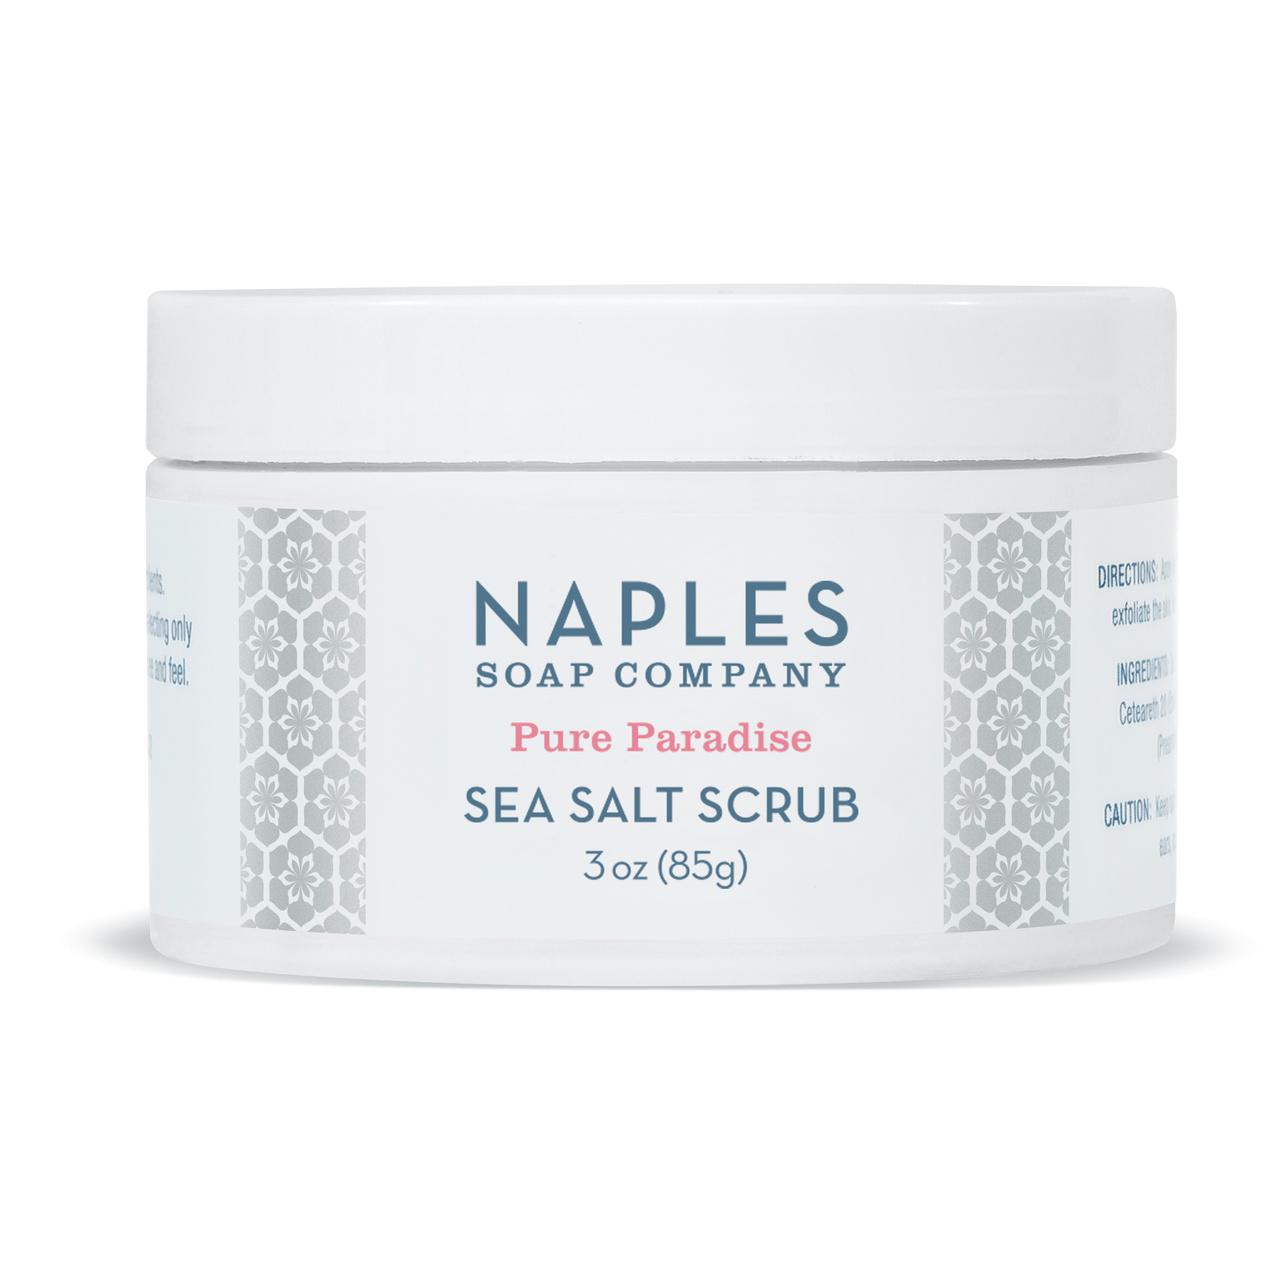 Naples Soap Co. Pure Paradise Sea Salt Scrub 3 oz